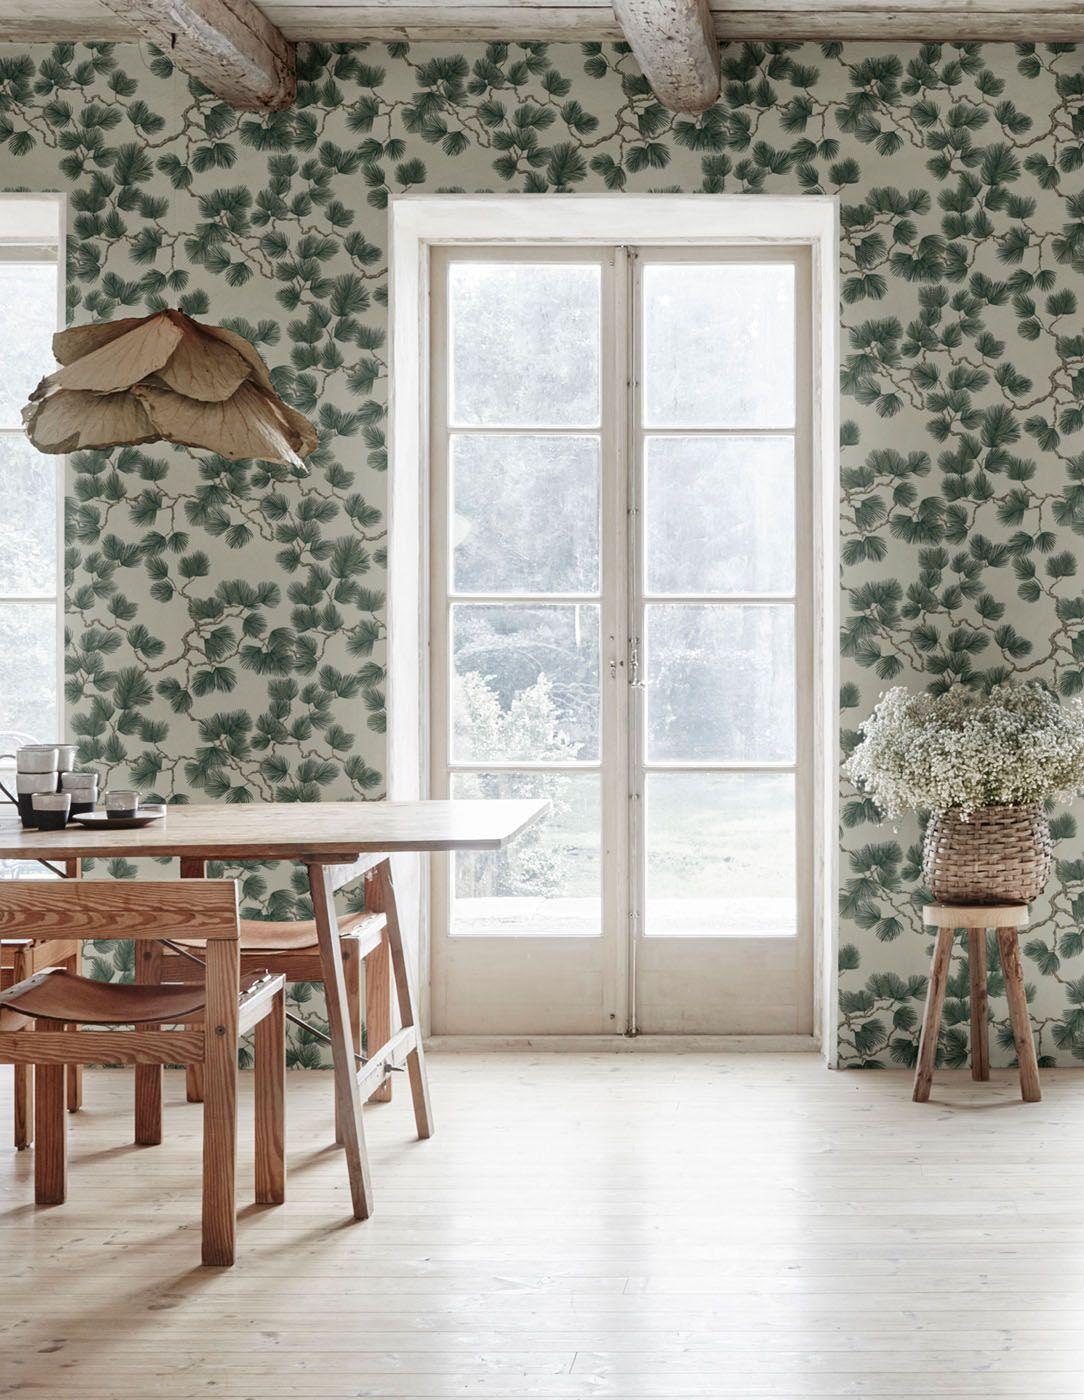 Pine Green in 2020 Green wallpaper, Bathroom wallpaper